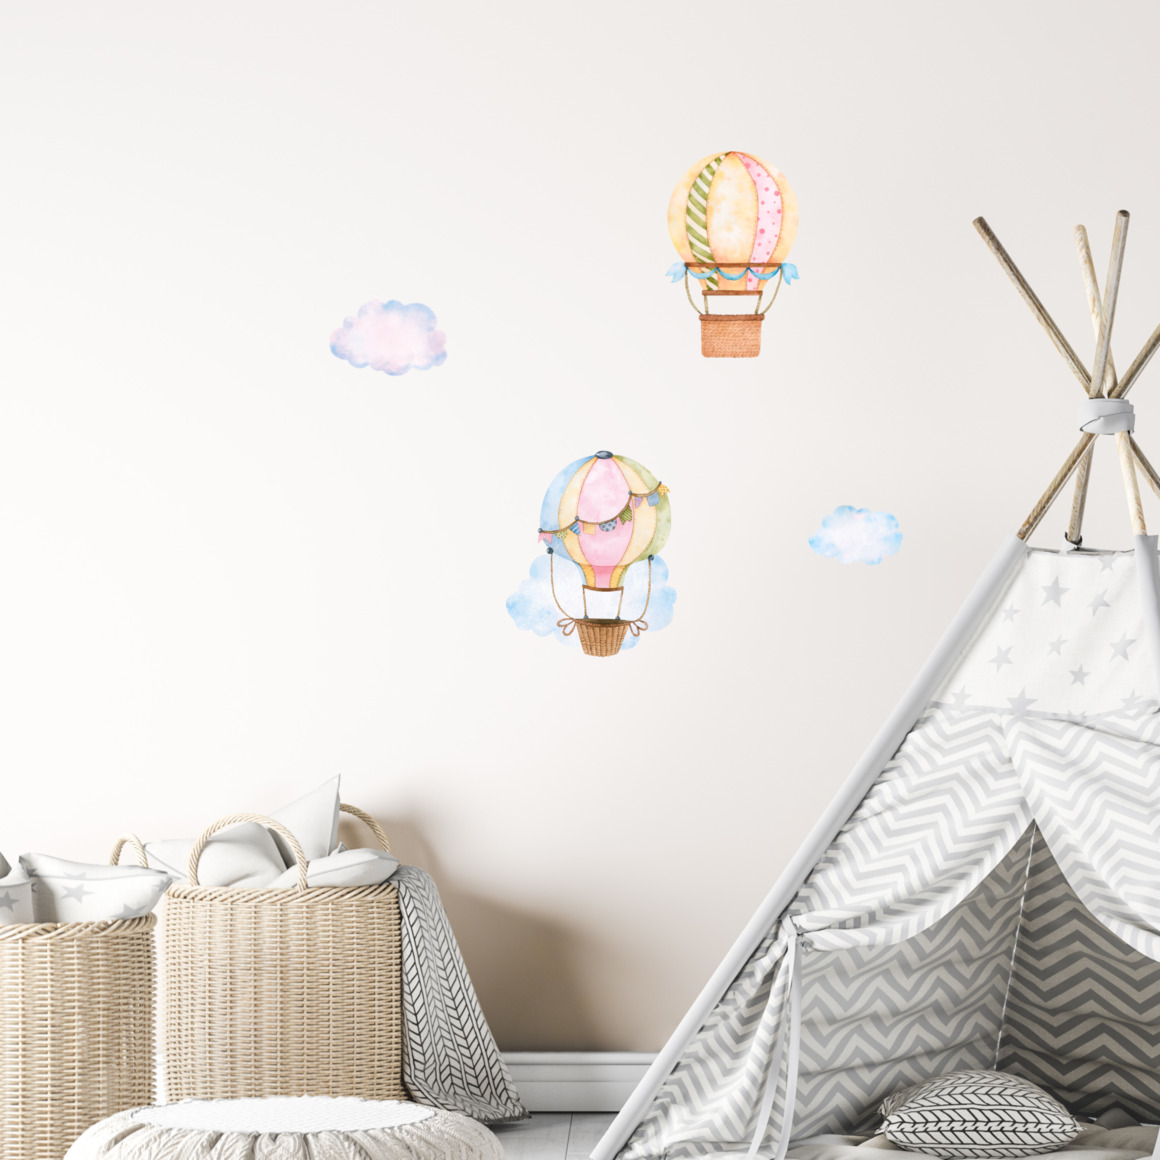 Fabric wall decals - Hot air balloons   Trada Marketplace